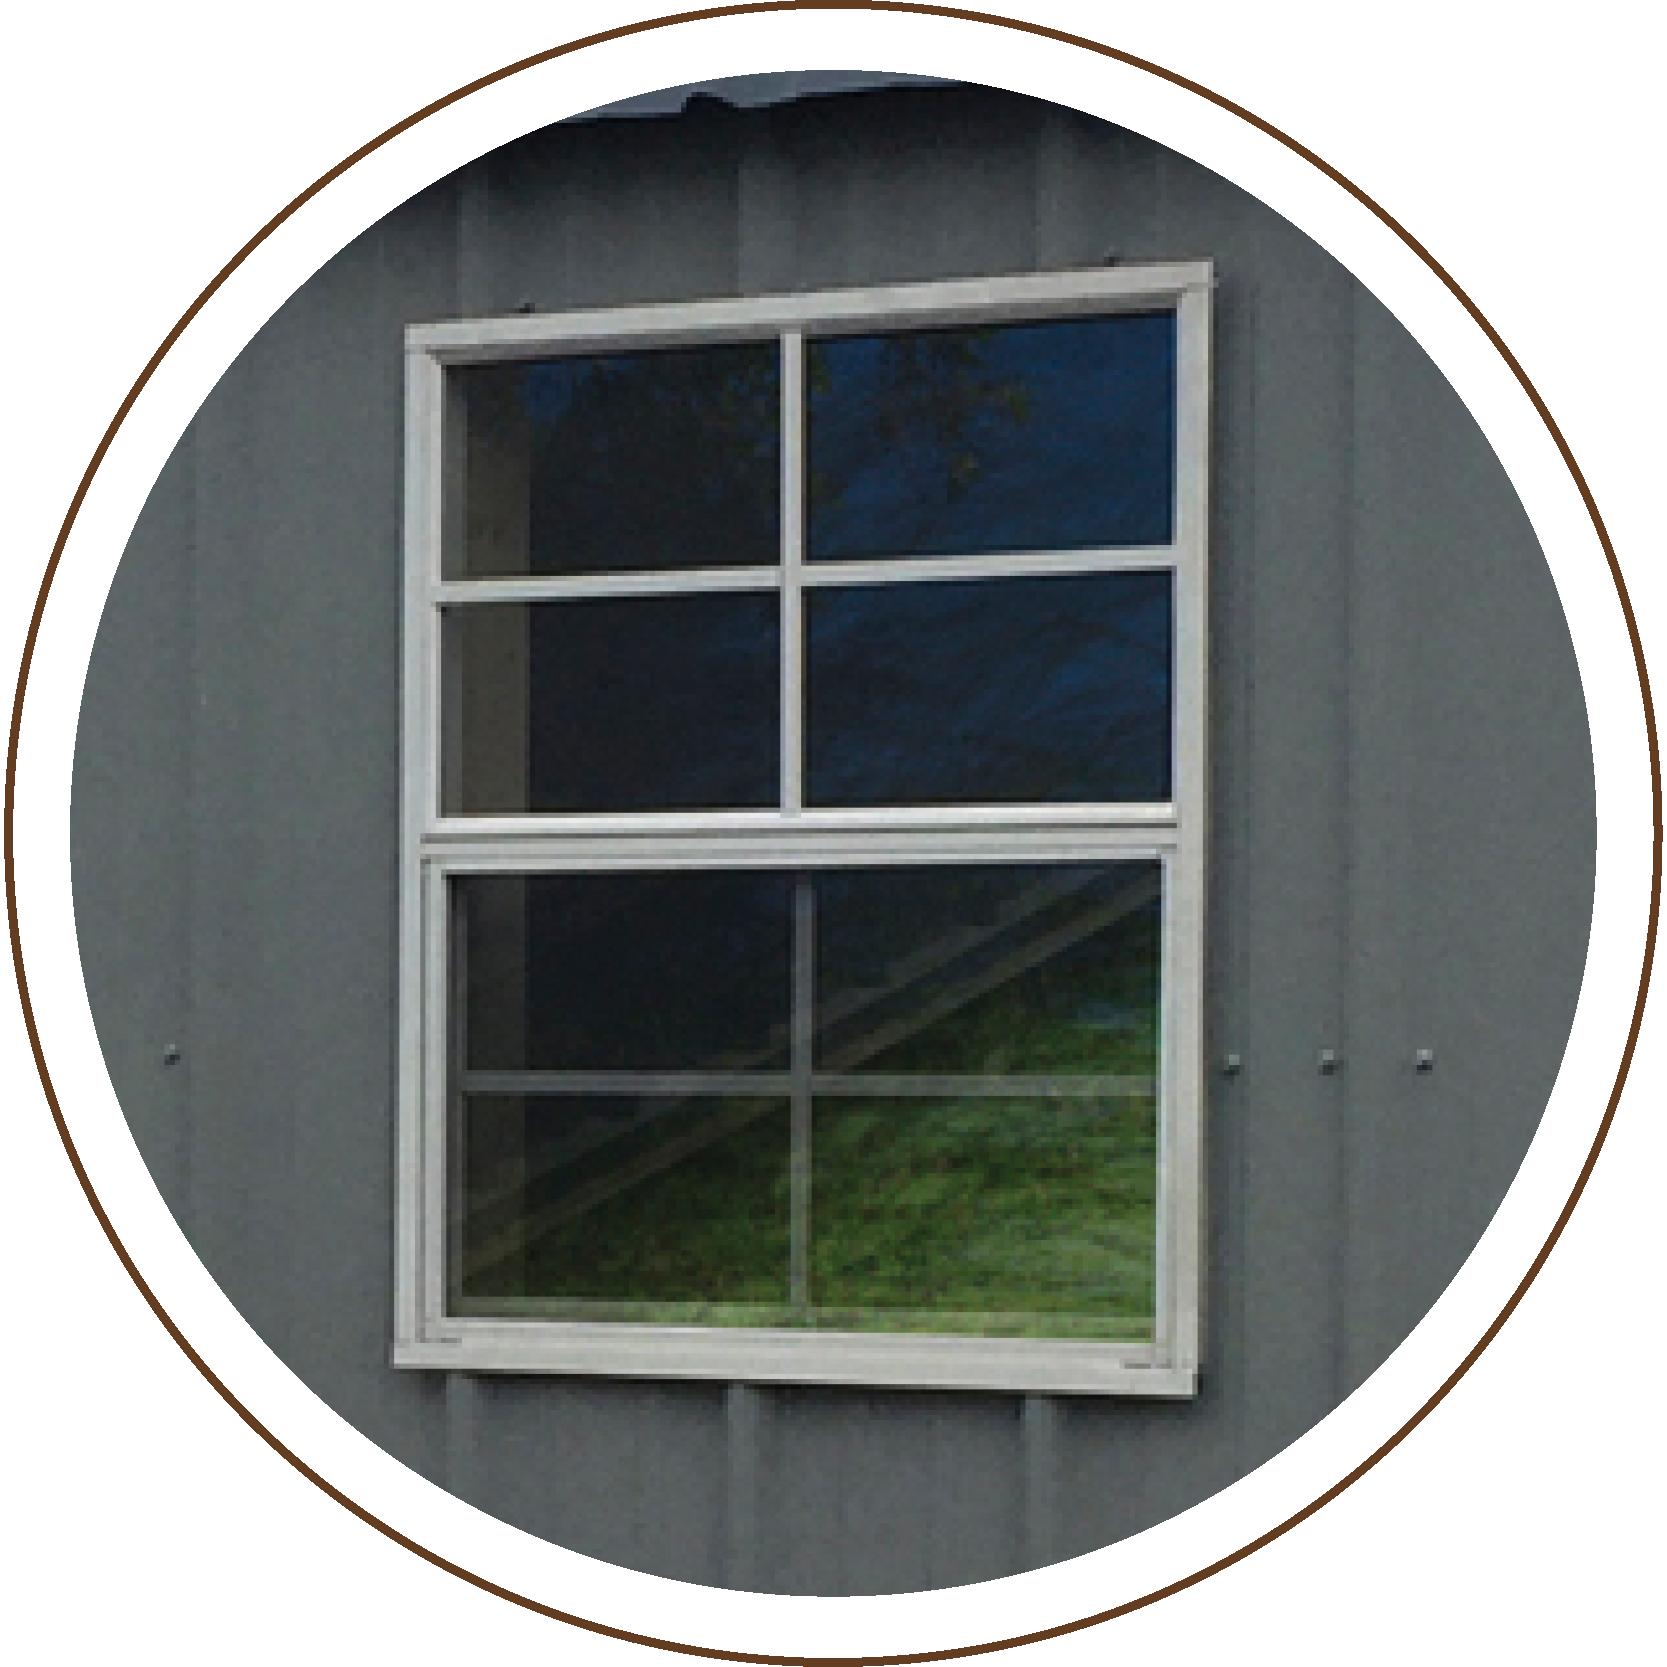 EverydayGarage_Windows